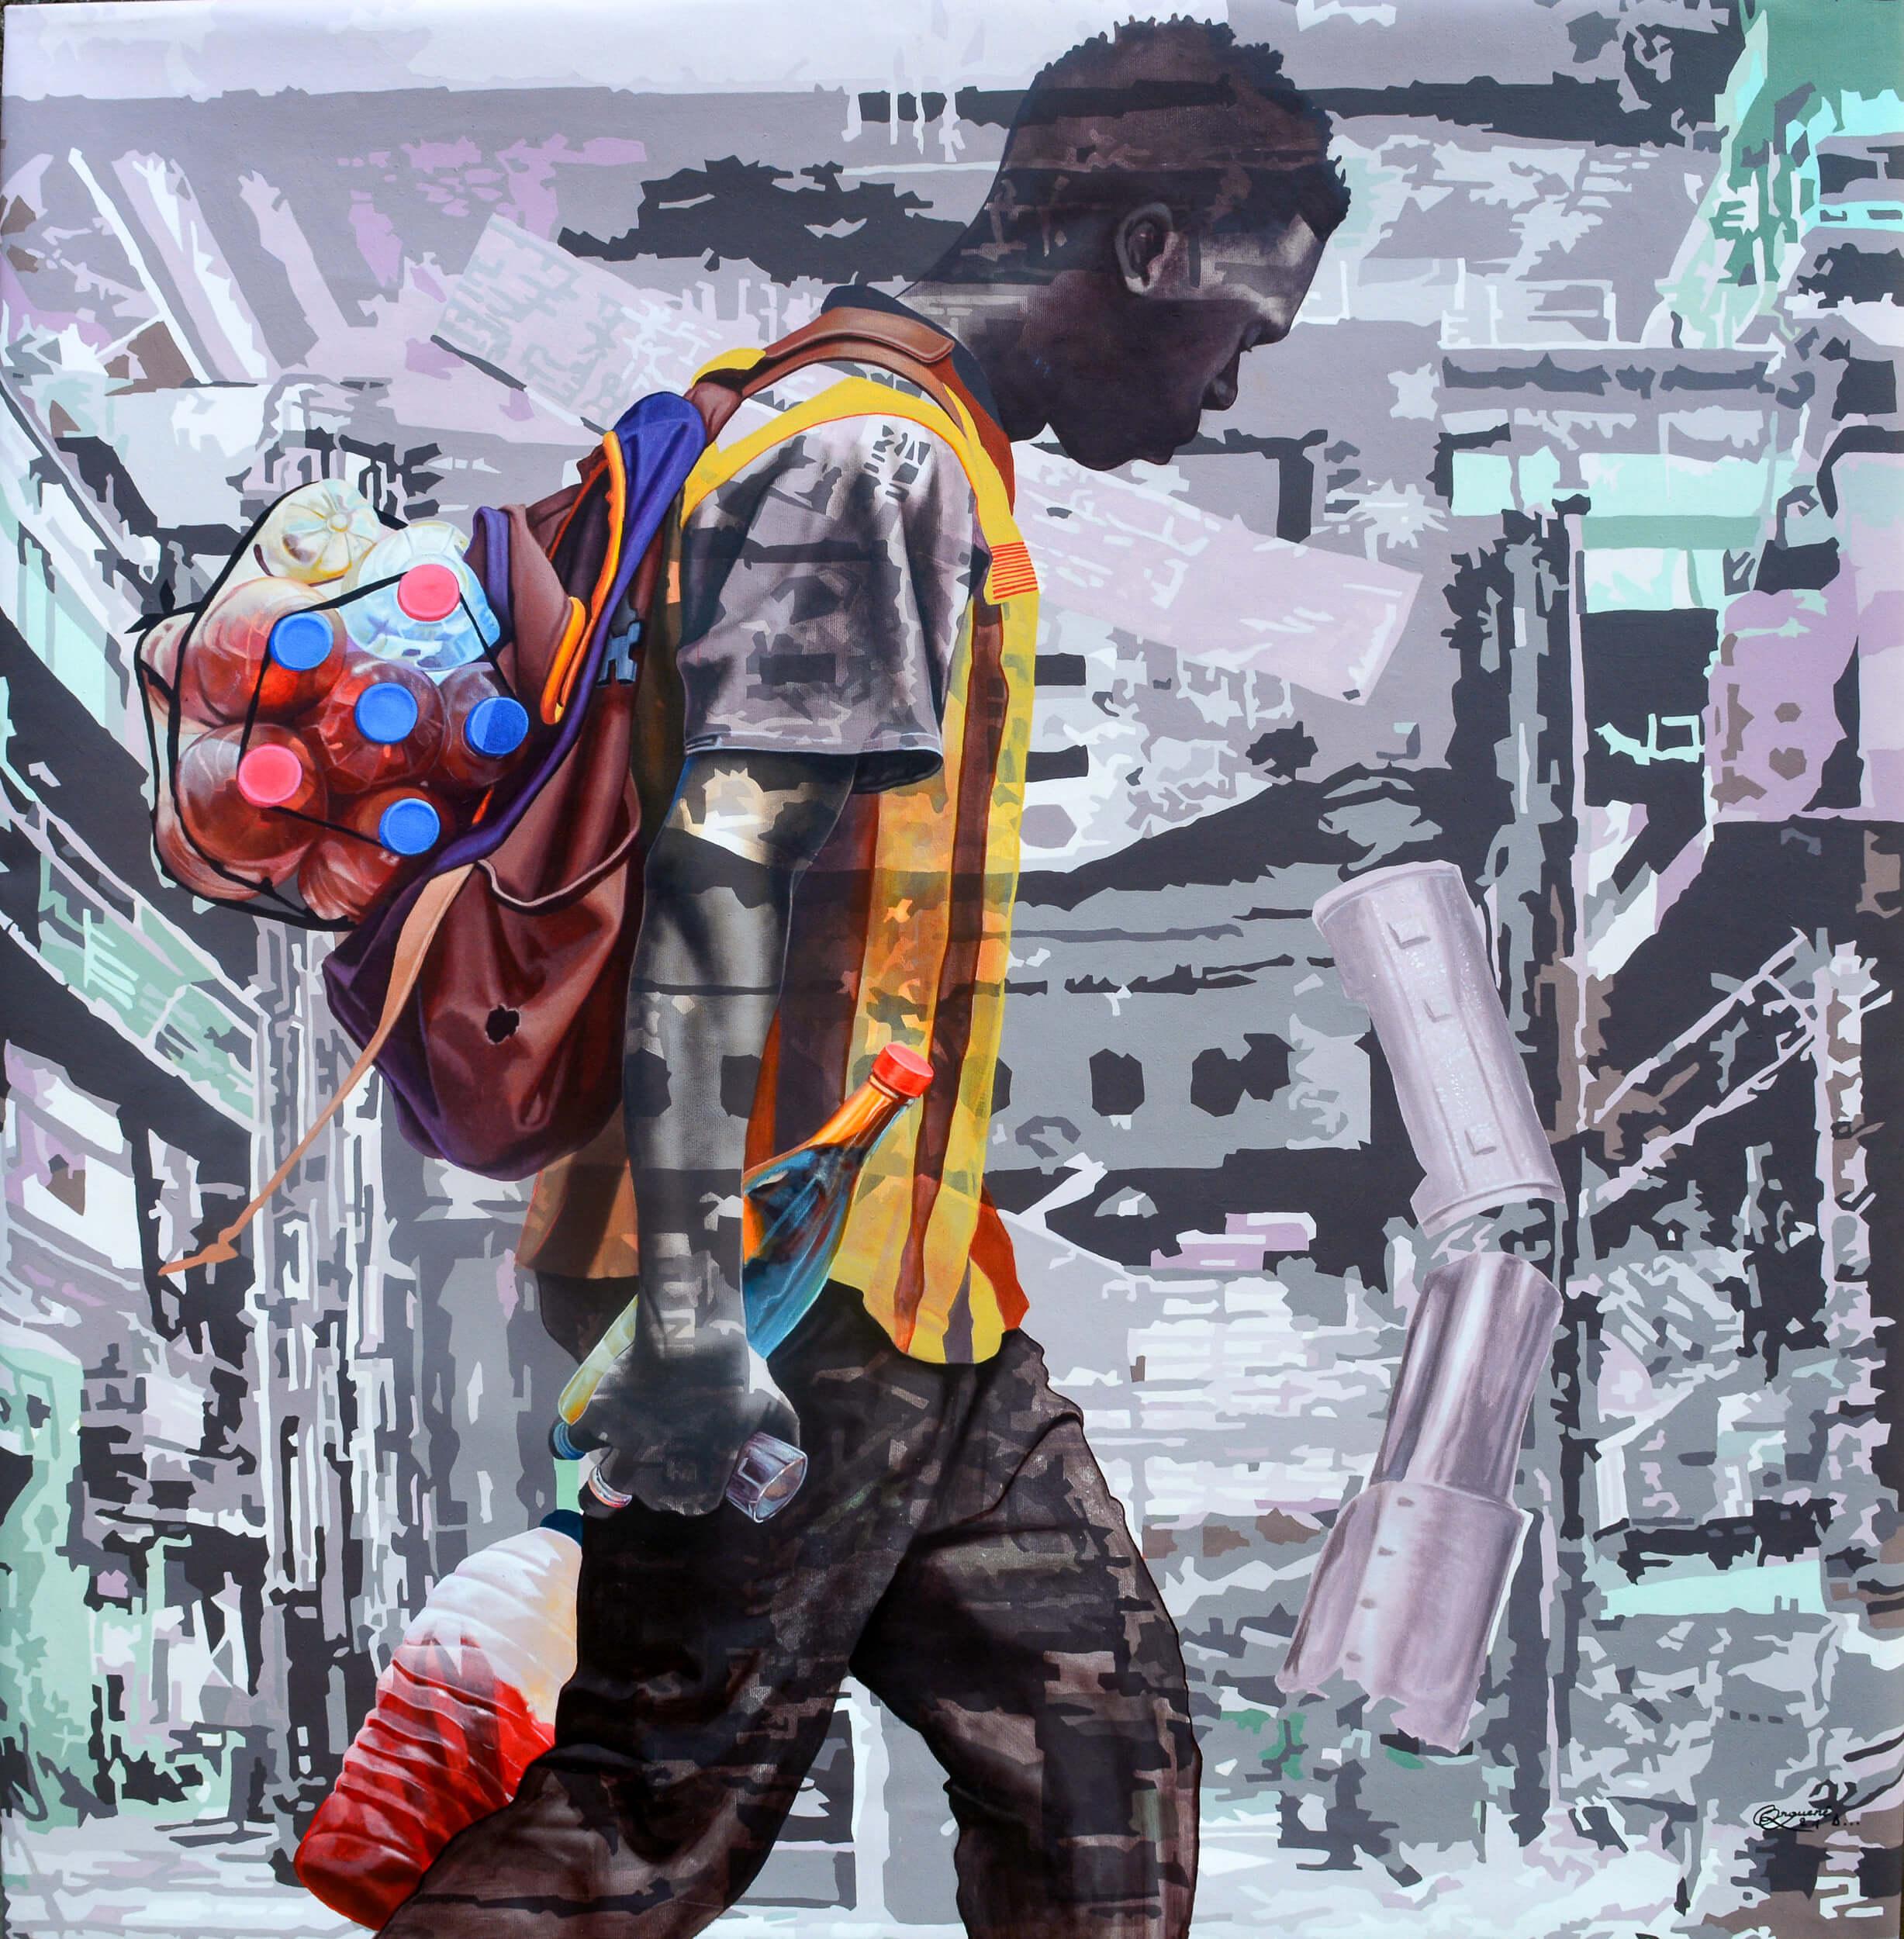 artsy-Daniel Onguene - Kin-Kin - 120cm H x 110cm W - Acrylic on canvas -2105